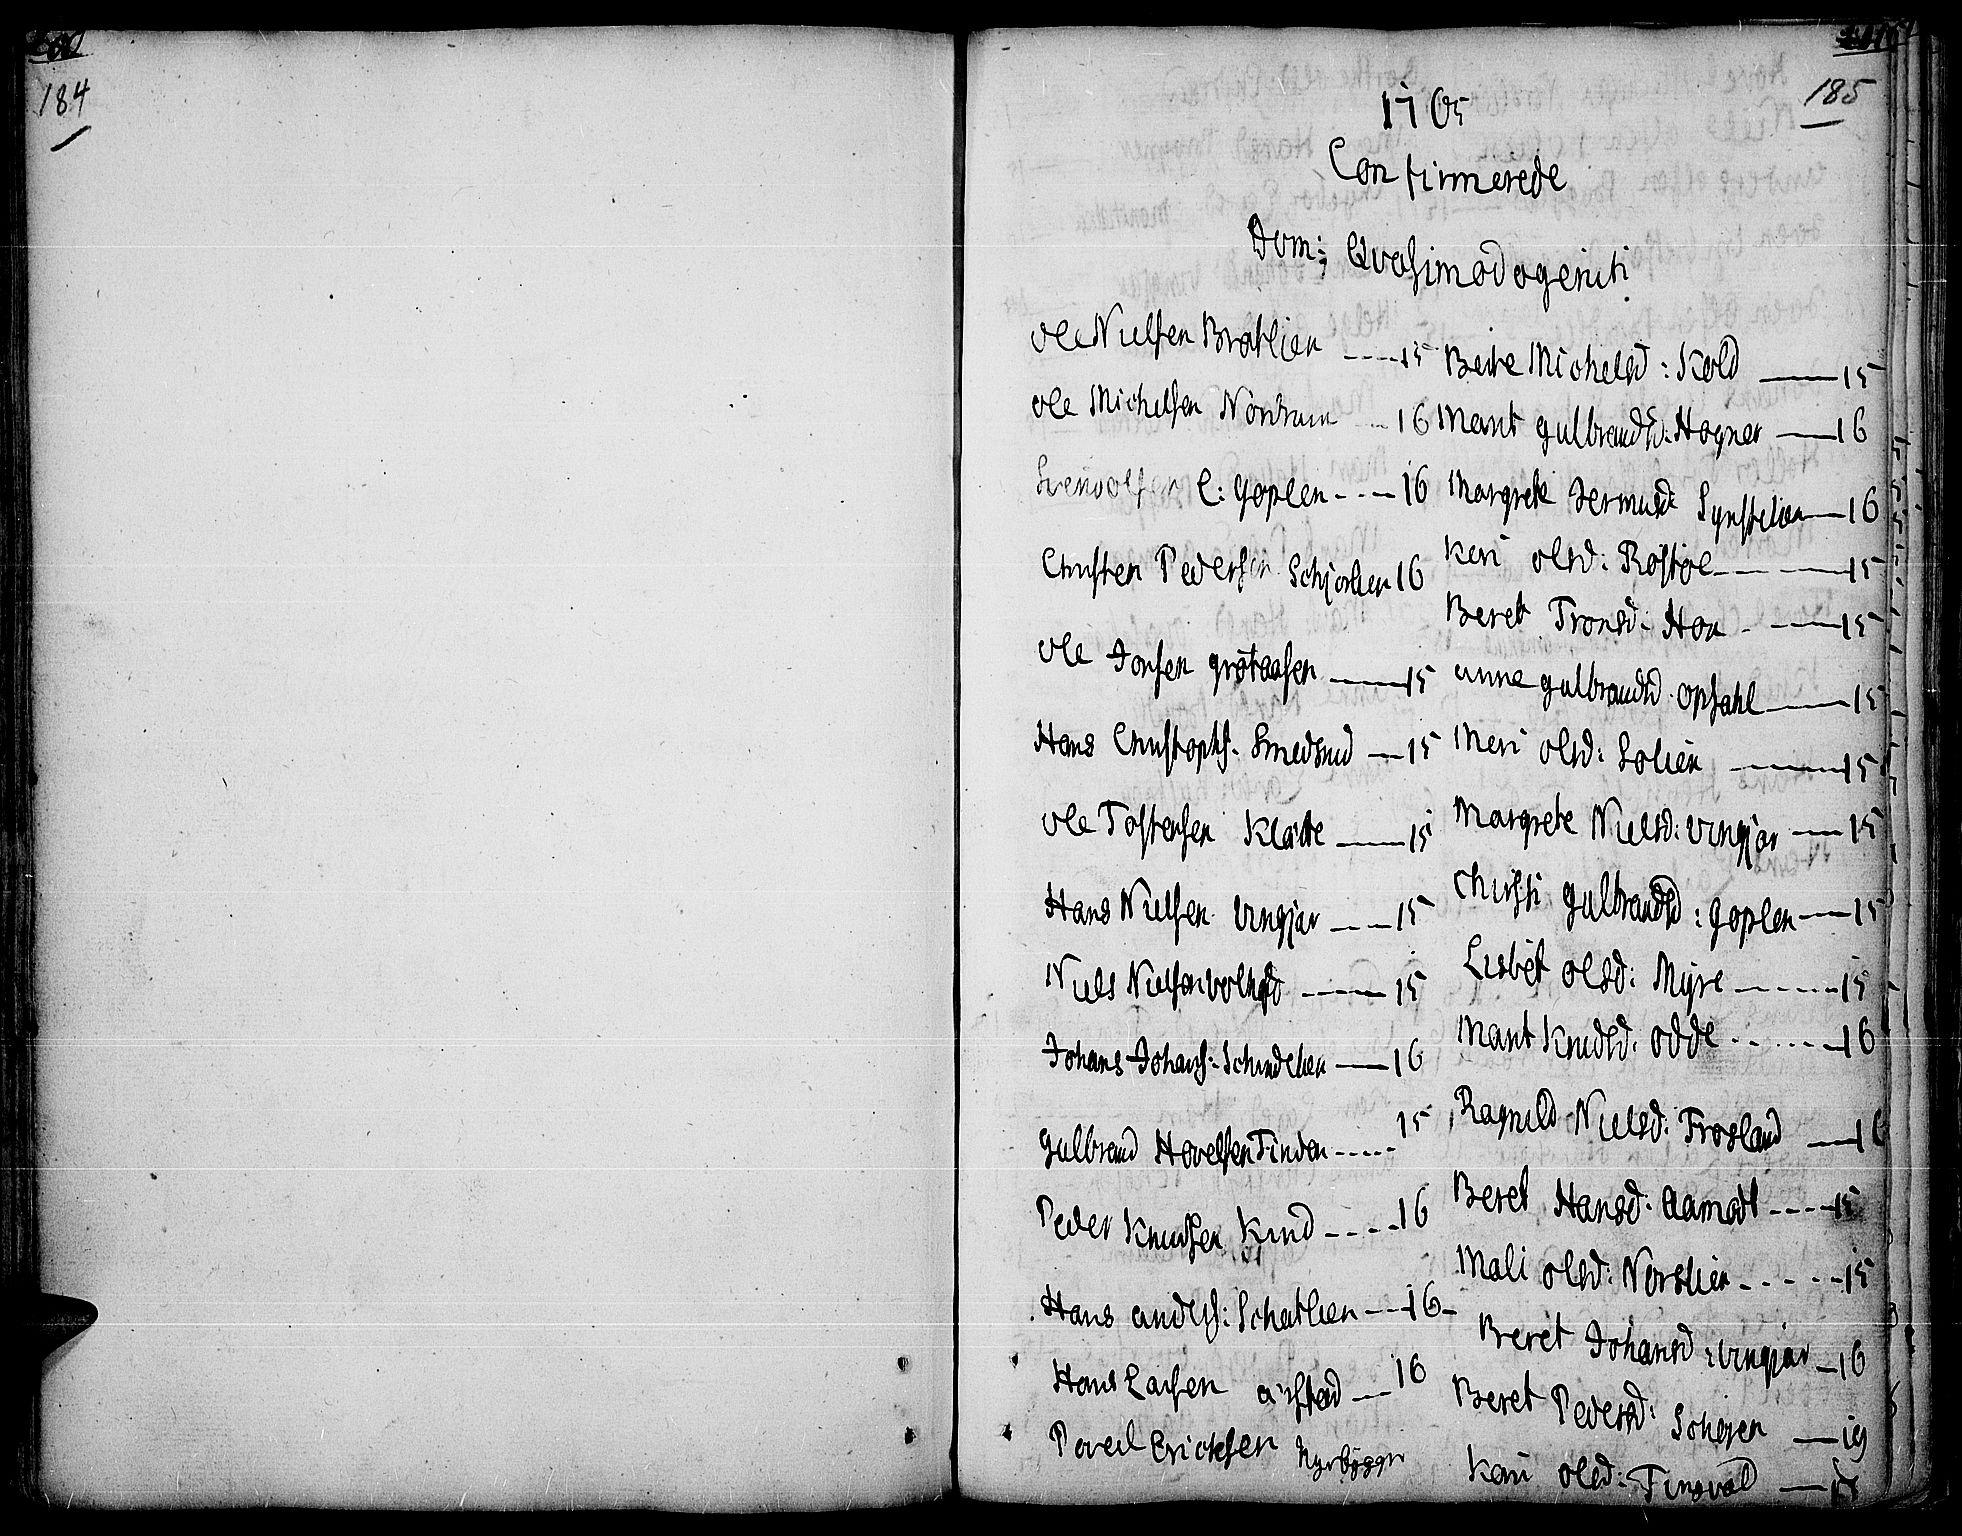 SAH, Land prestekontor, Ministerialbok nr. 5, 1765-1784, s. 184-185